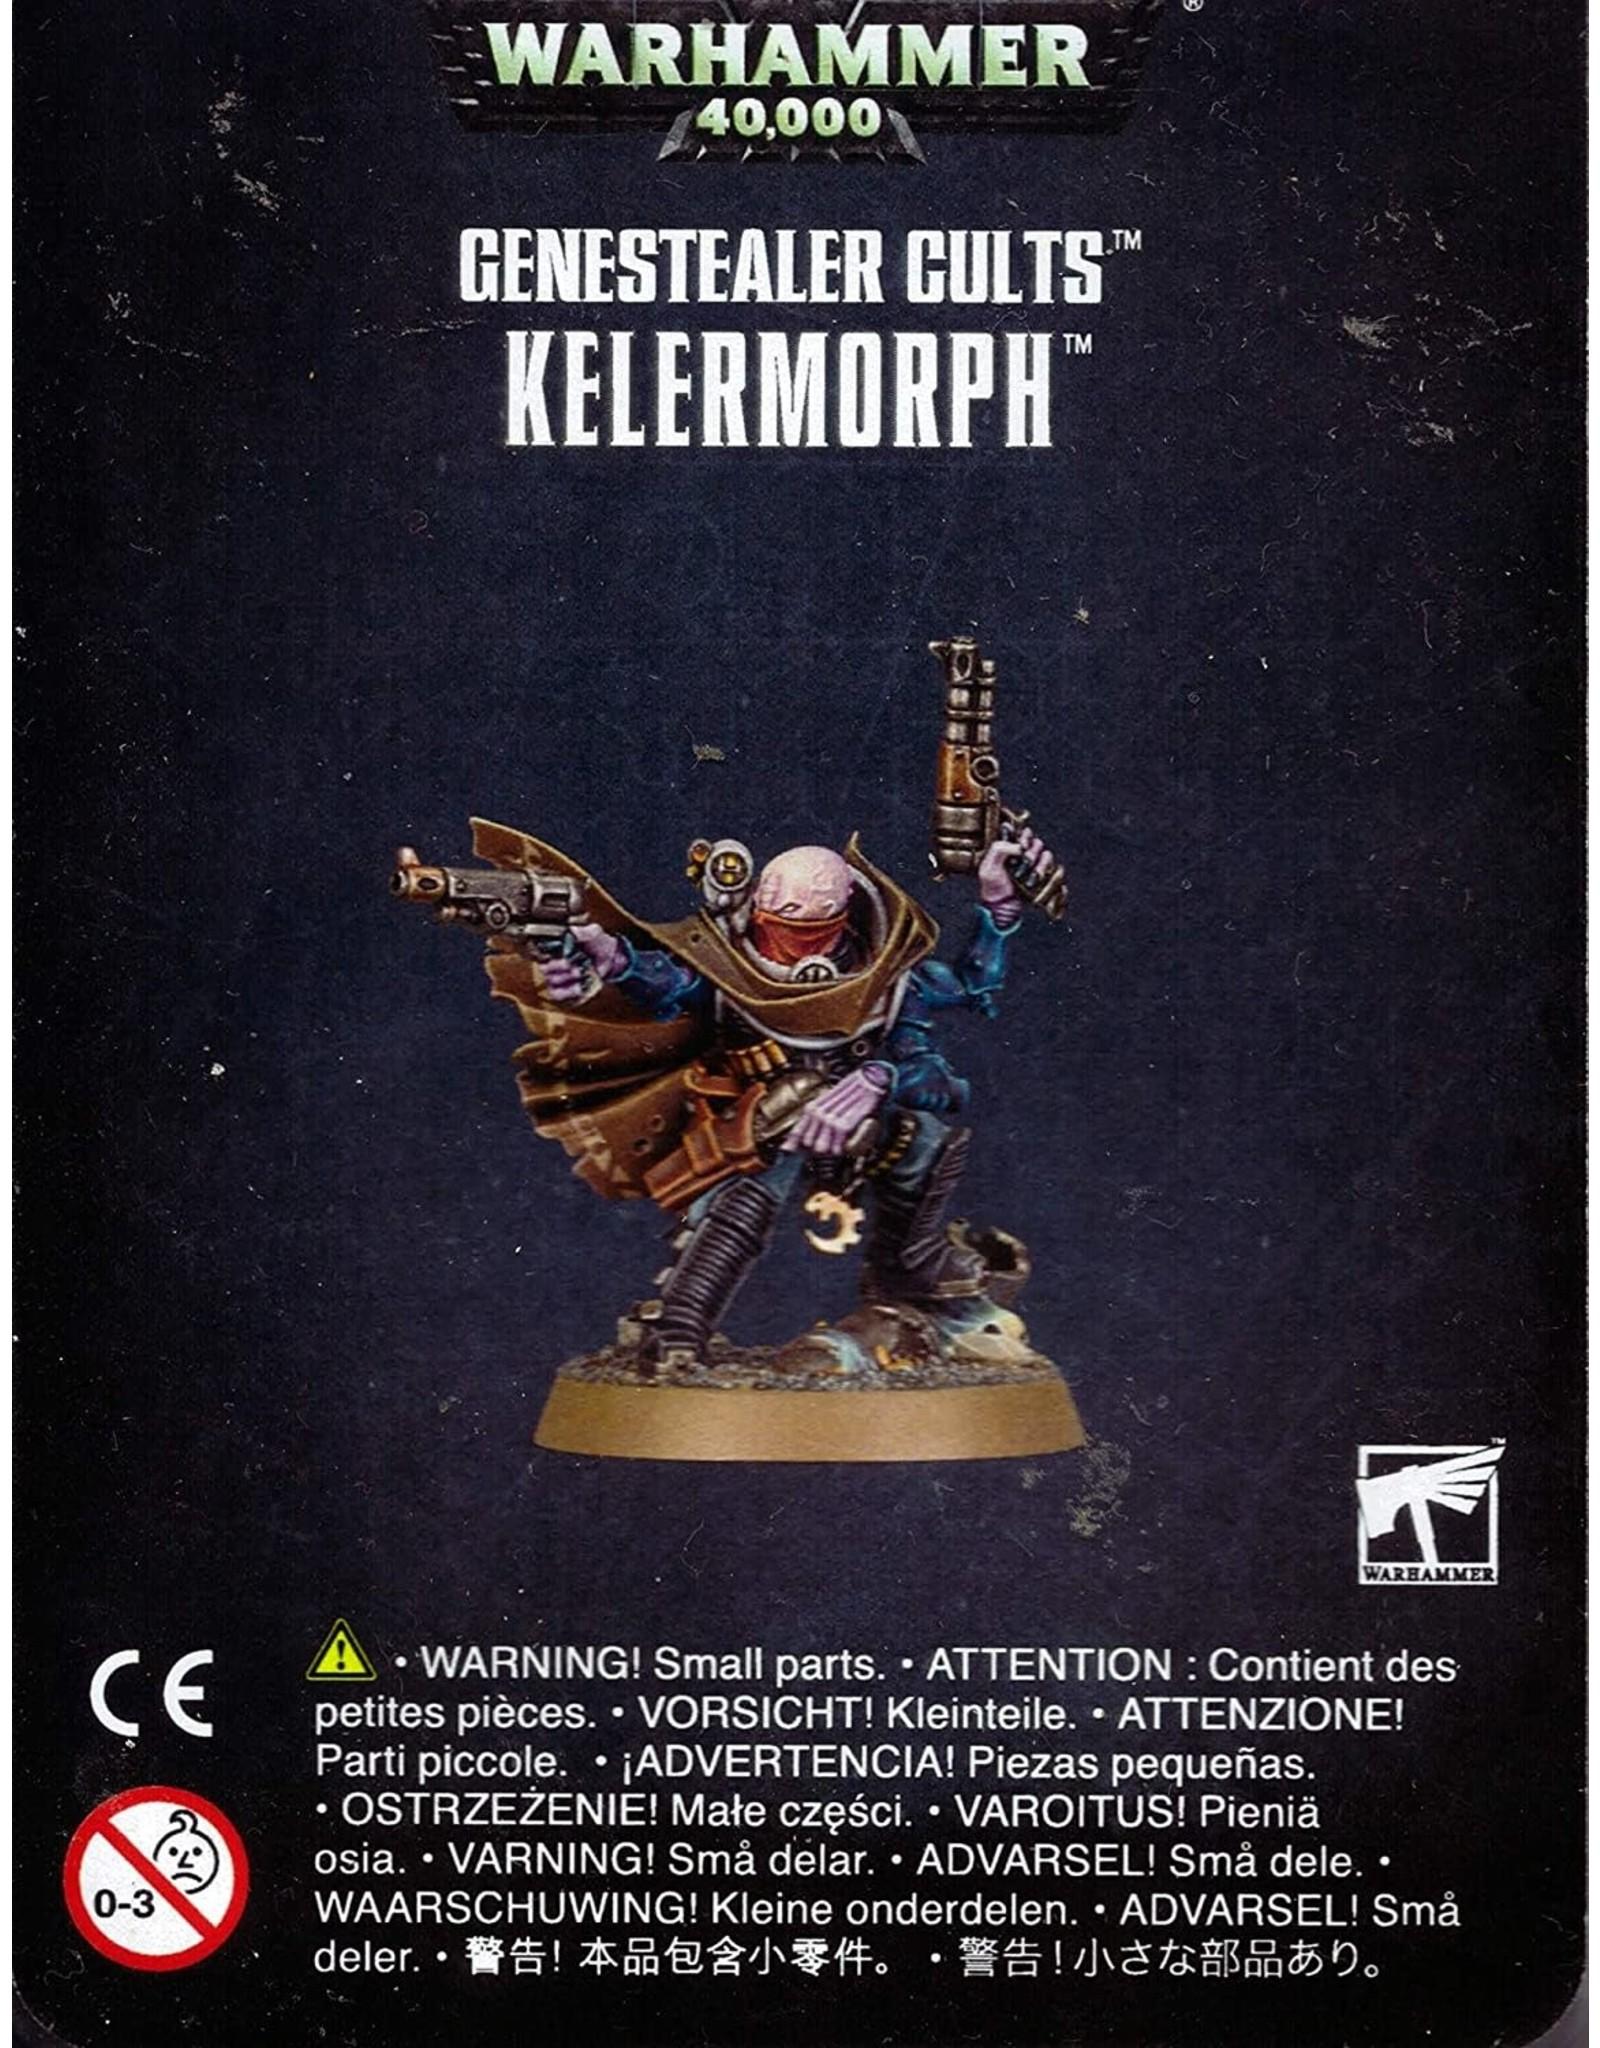 Genestealer Cults Kelermorph (40K)